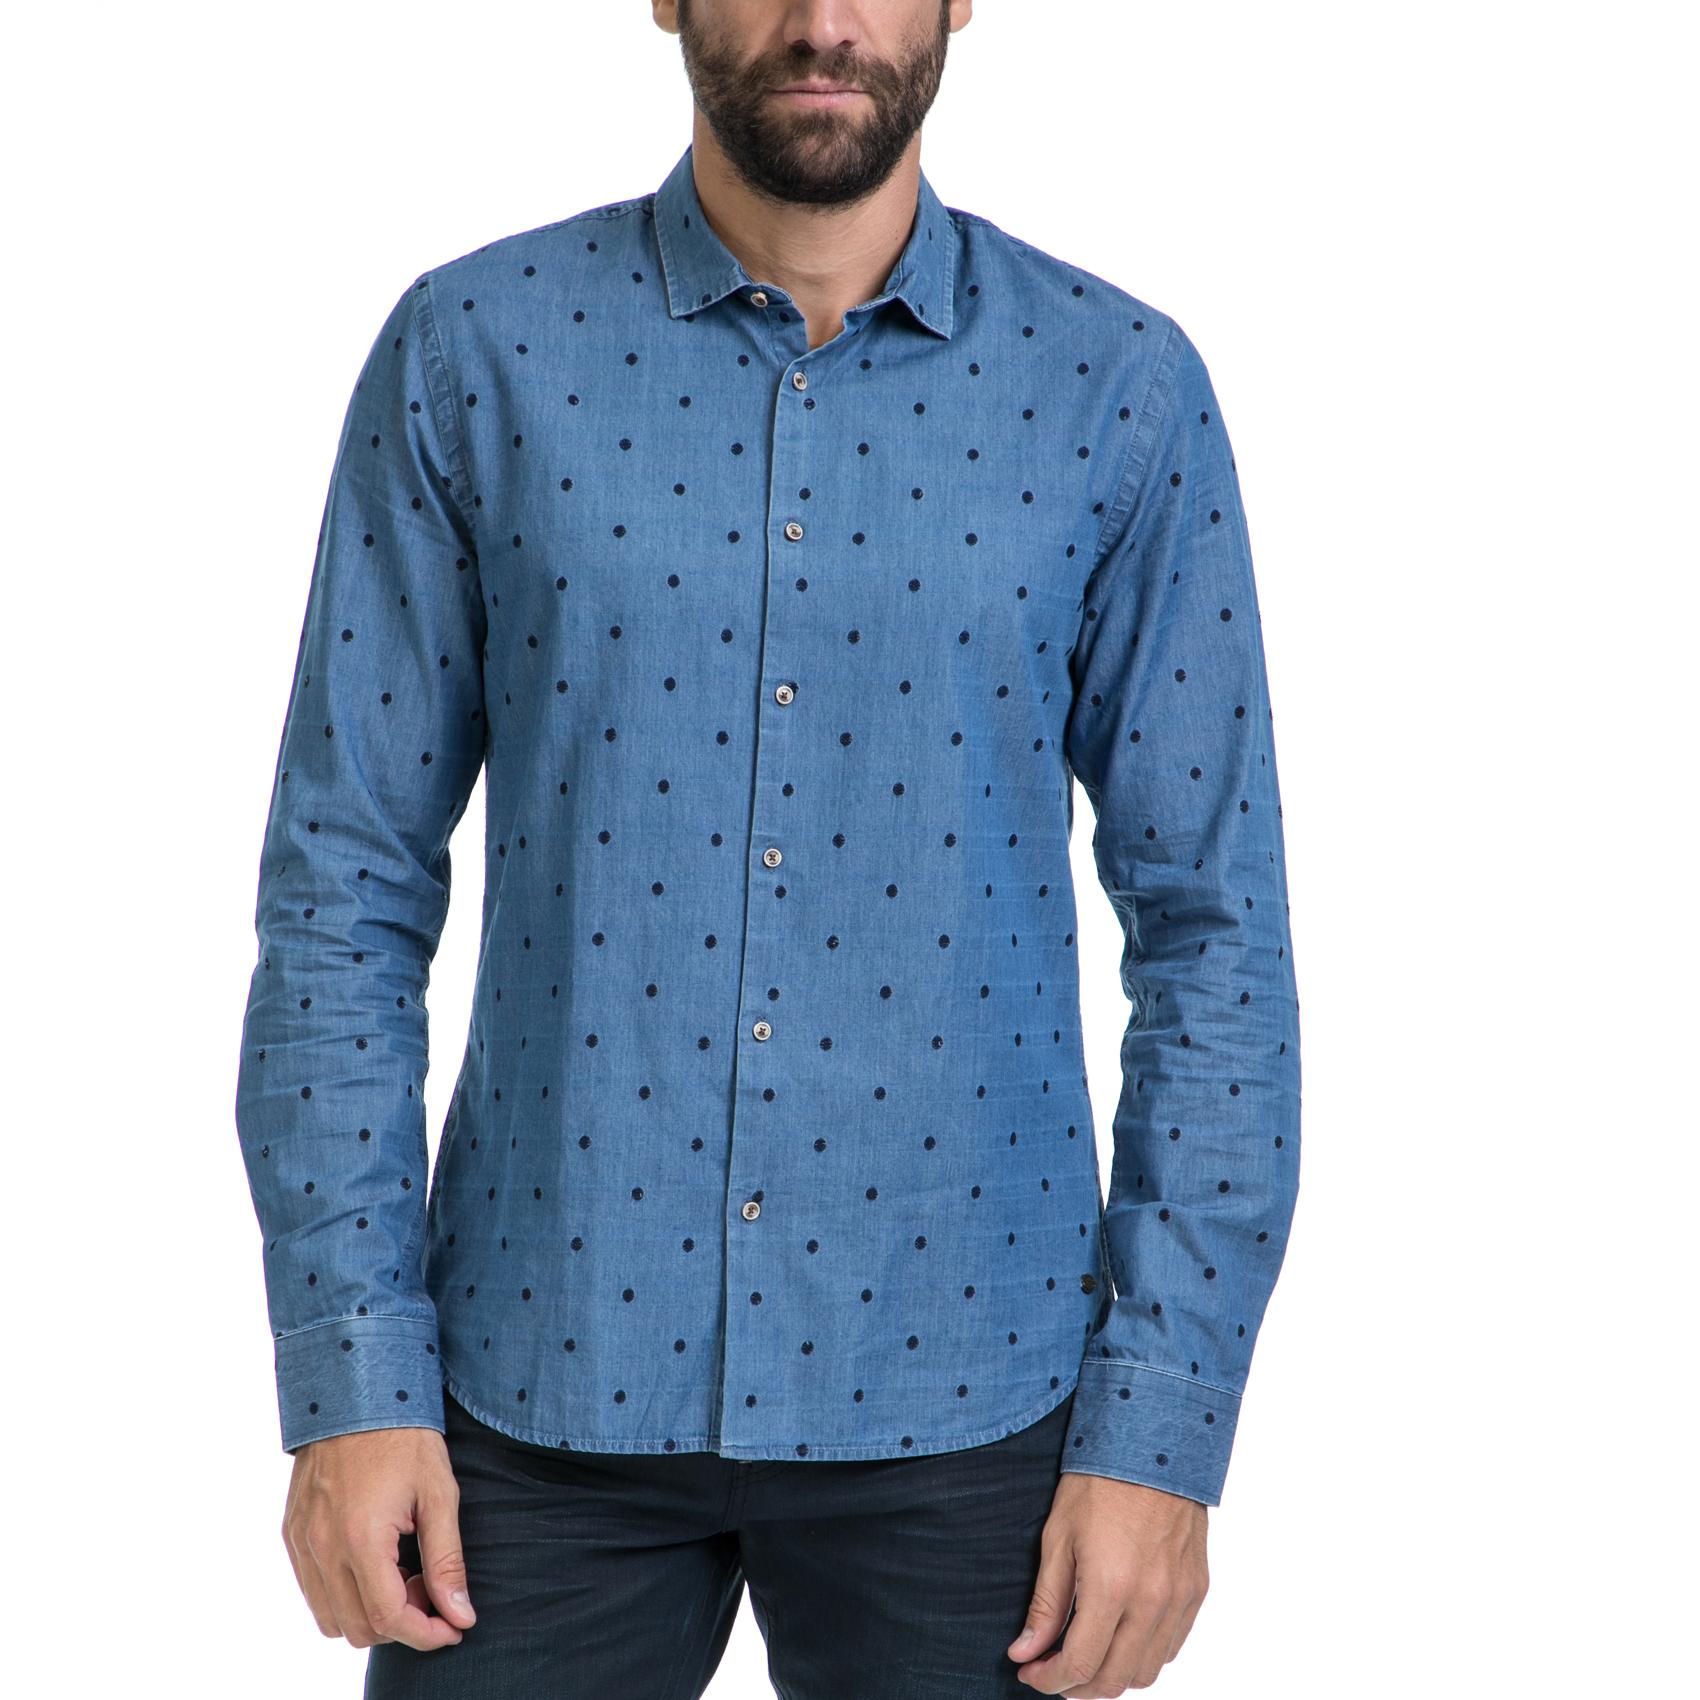 79bbc15d3ef6 SCOTCH   SODA – Ανδρικό πουκάμισο SCOTCH   SODA μπλε – Online Ρούχα